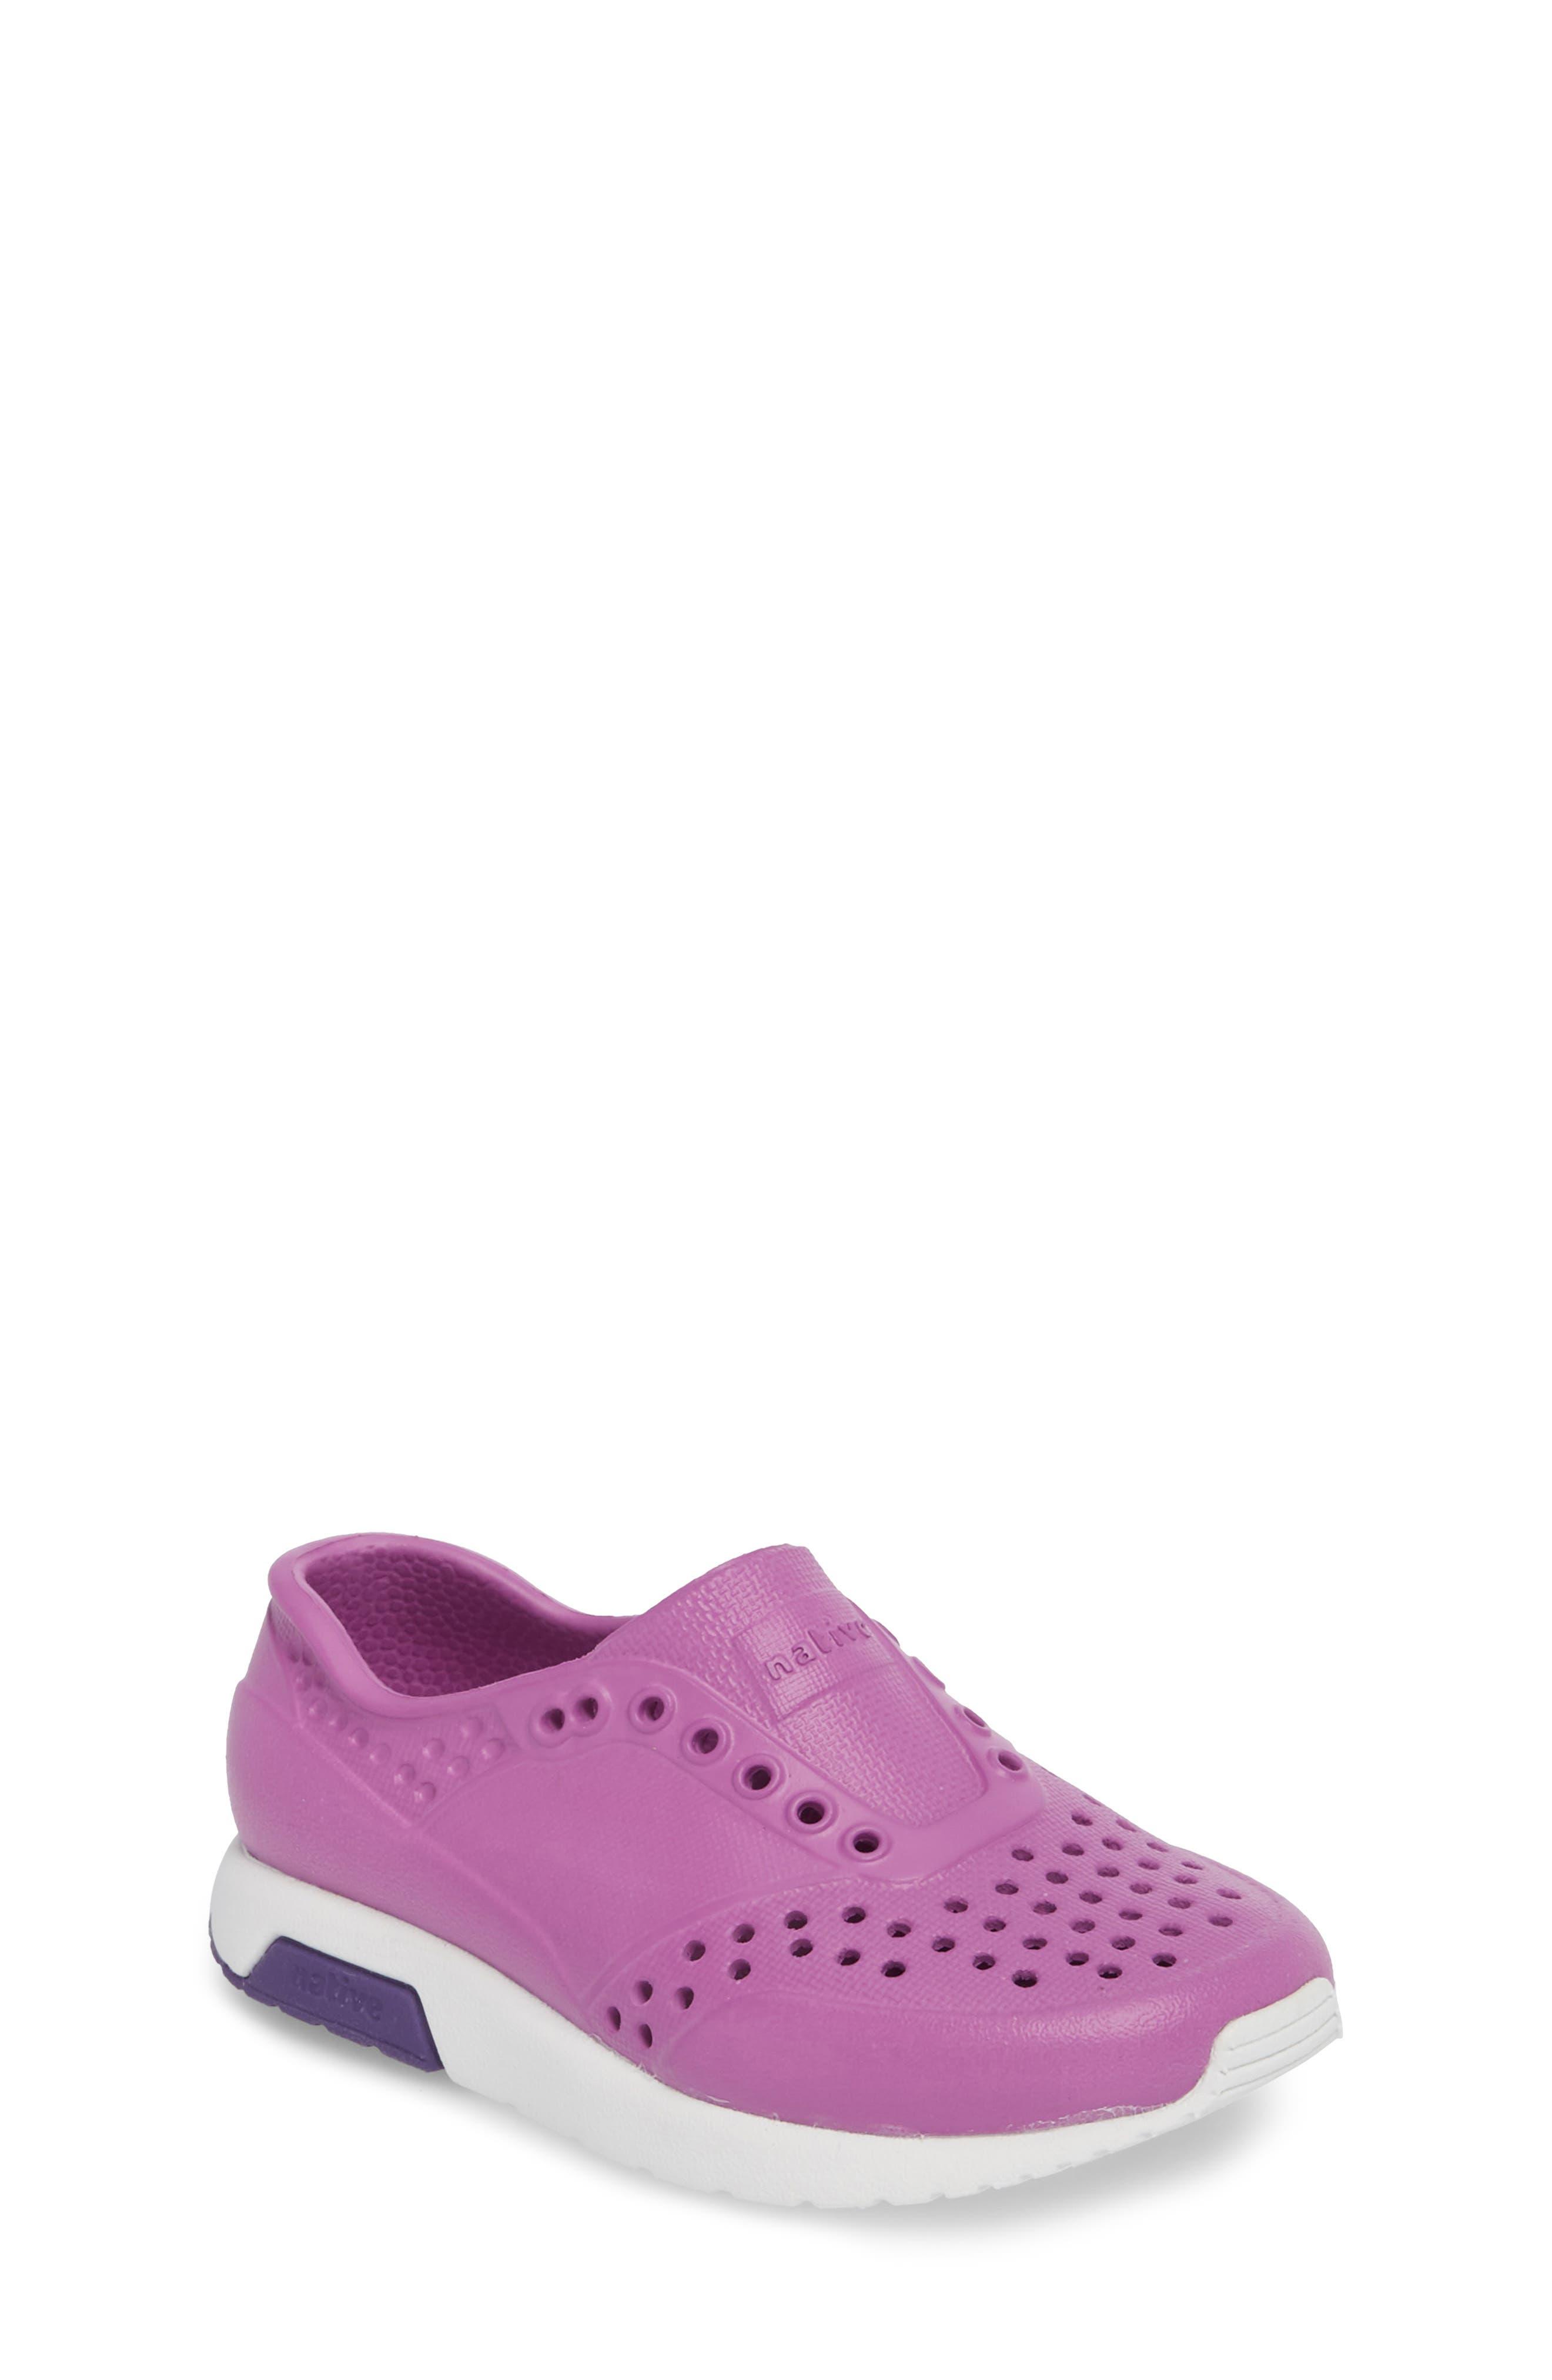 Lennox Slip-On Sneaker,                         Main,                         color, Peace Purple/ Shell White